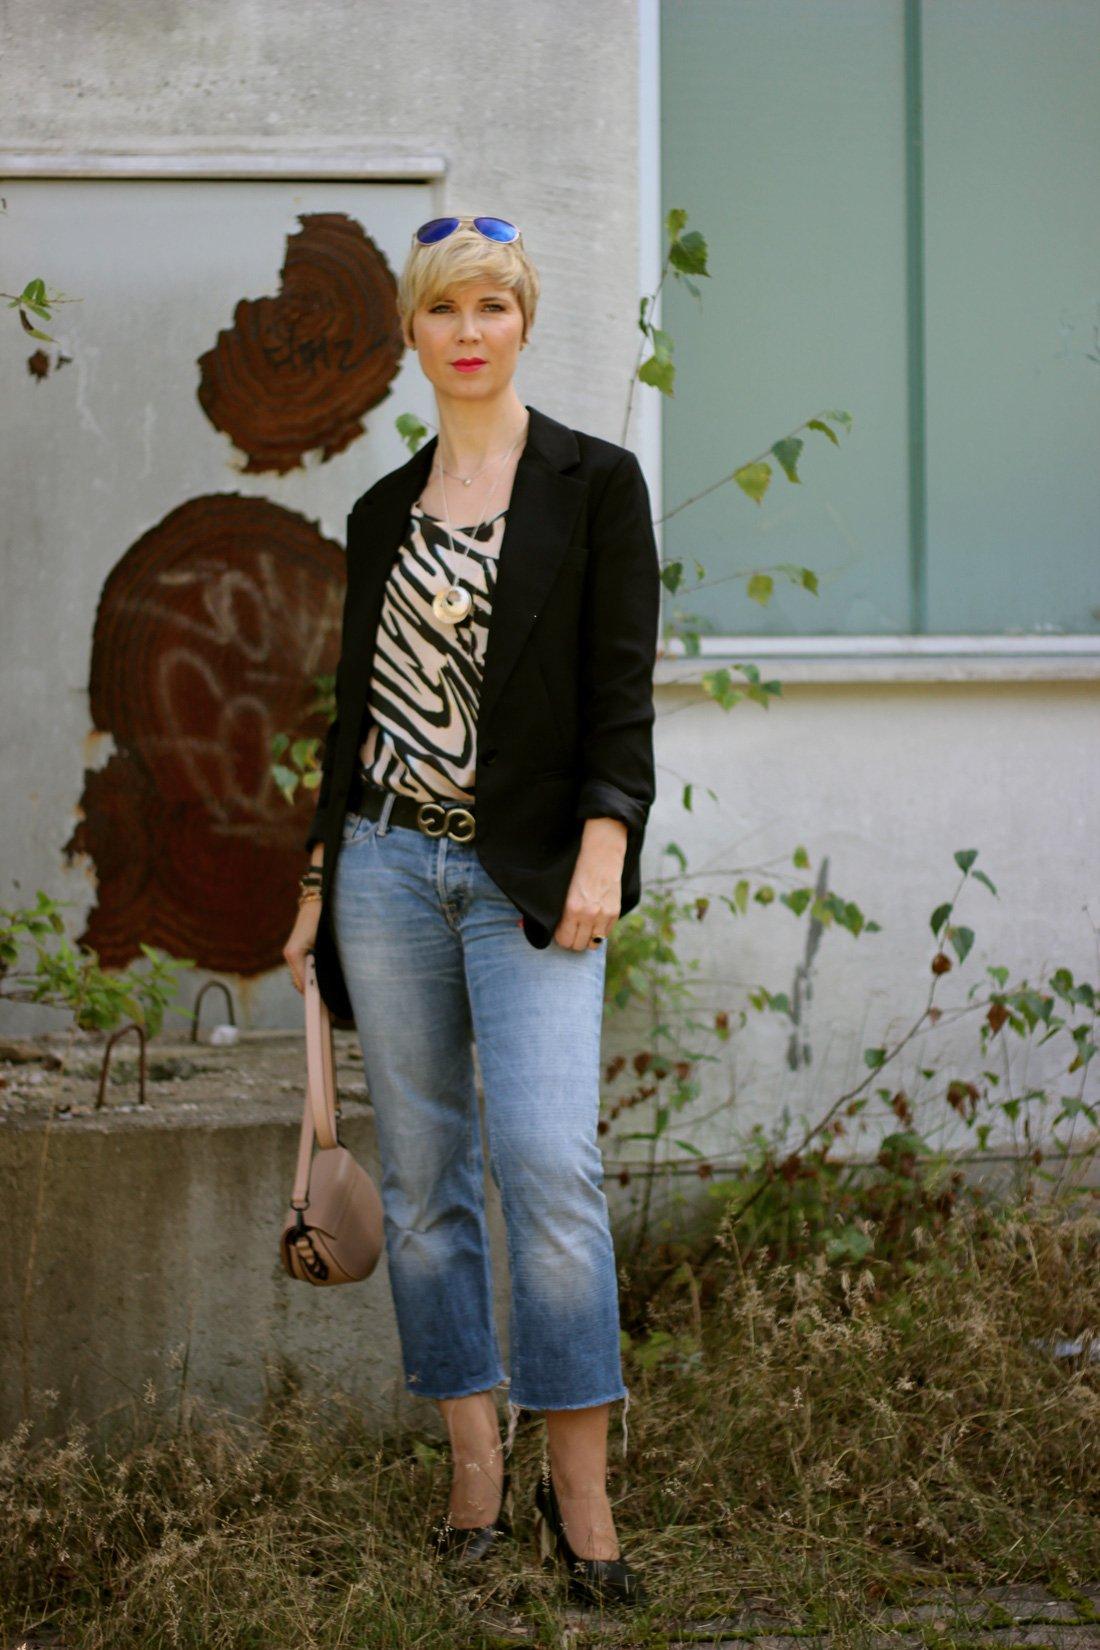 Conny Doll Lifestyle: Bayern wählt am Sonntag - nur wen? Übergangslook: Seidentop mit Longblazer, 7/8 Jeans, Pumps,